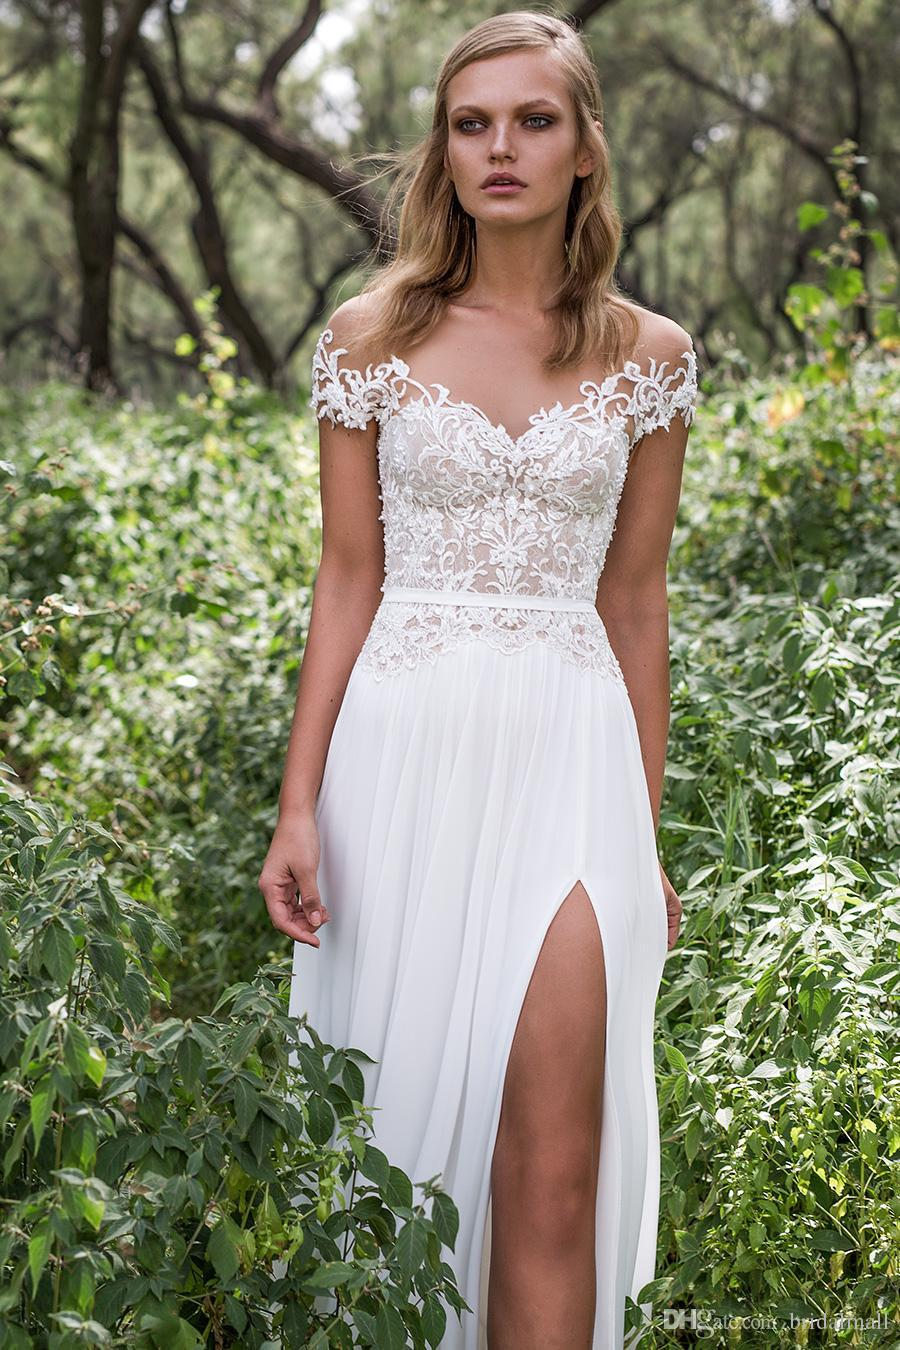 Bohemian Modest Chiffon A Line Wedding Dresses Sheer Neck Cap Sleeves Boho Beach Bridal Dress Sexy High Split Country Wedding Gowns Vestidos